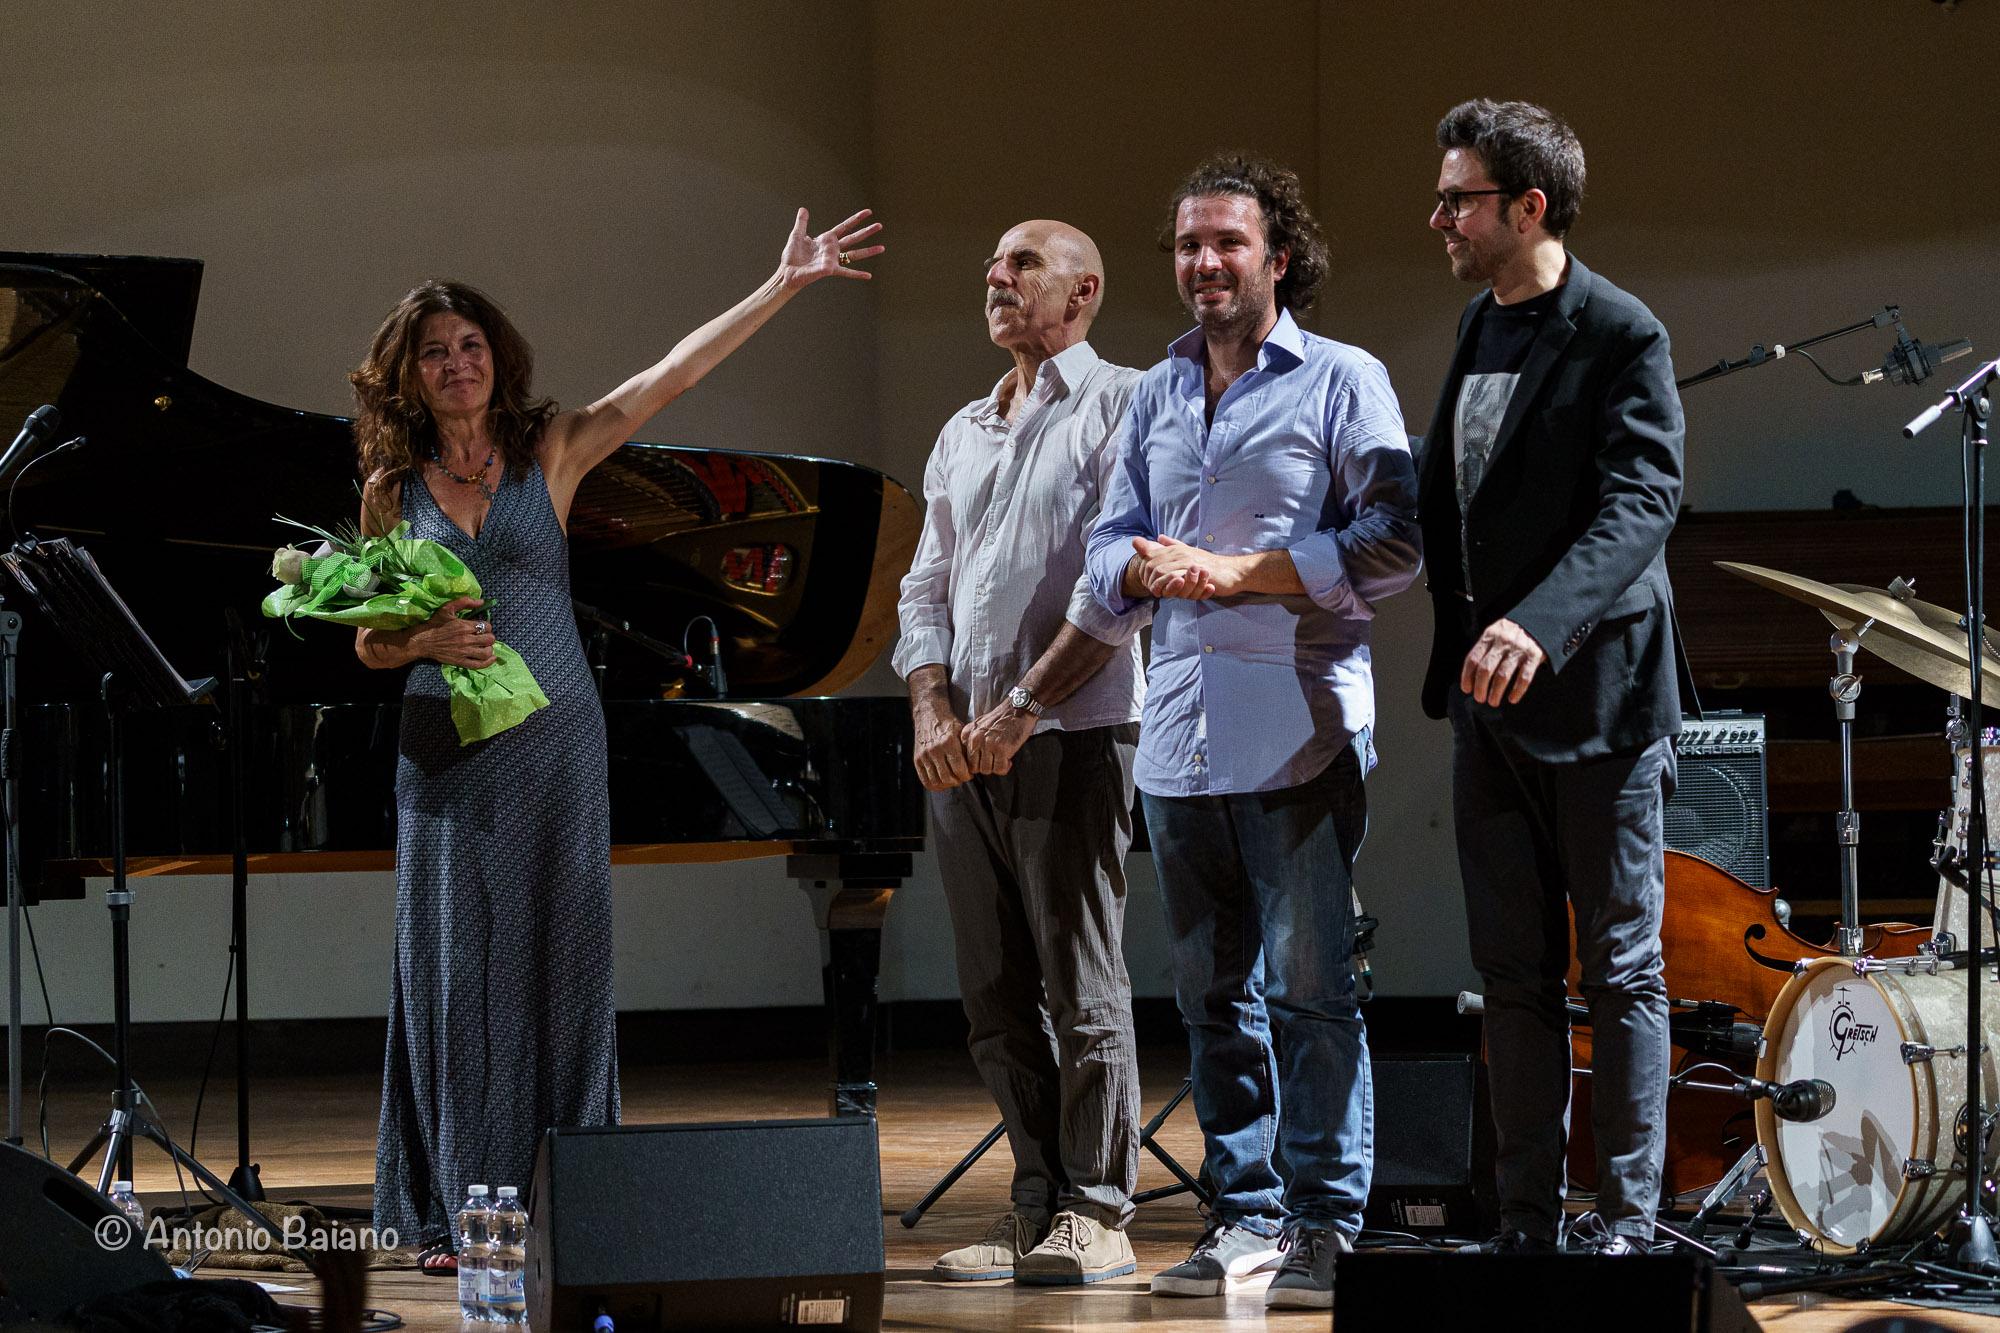 Maria Pia De Vito Quartet